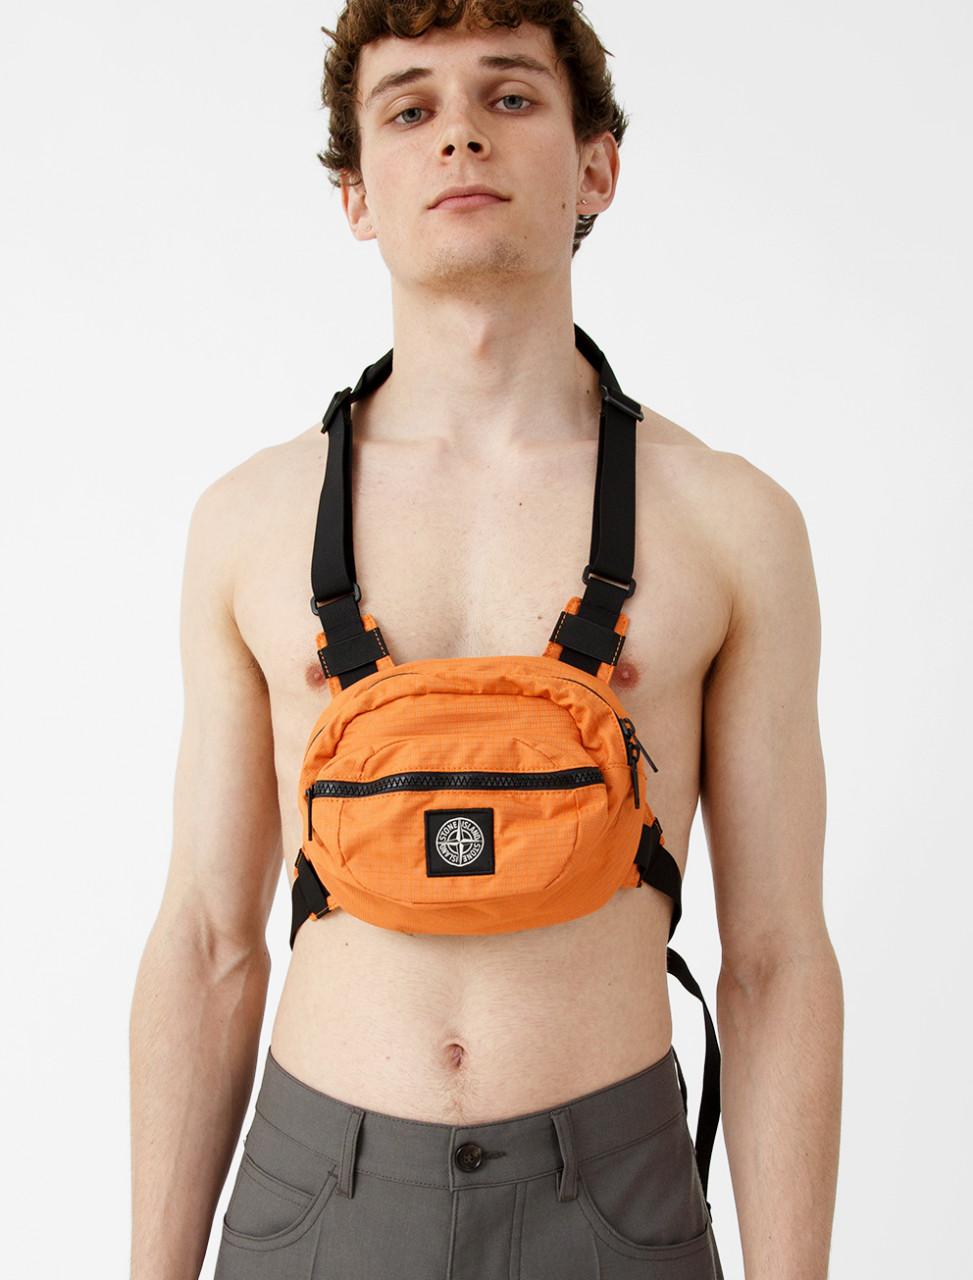 Waistbag in Orange